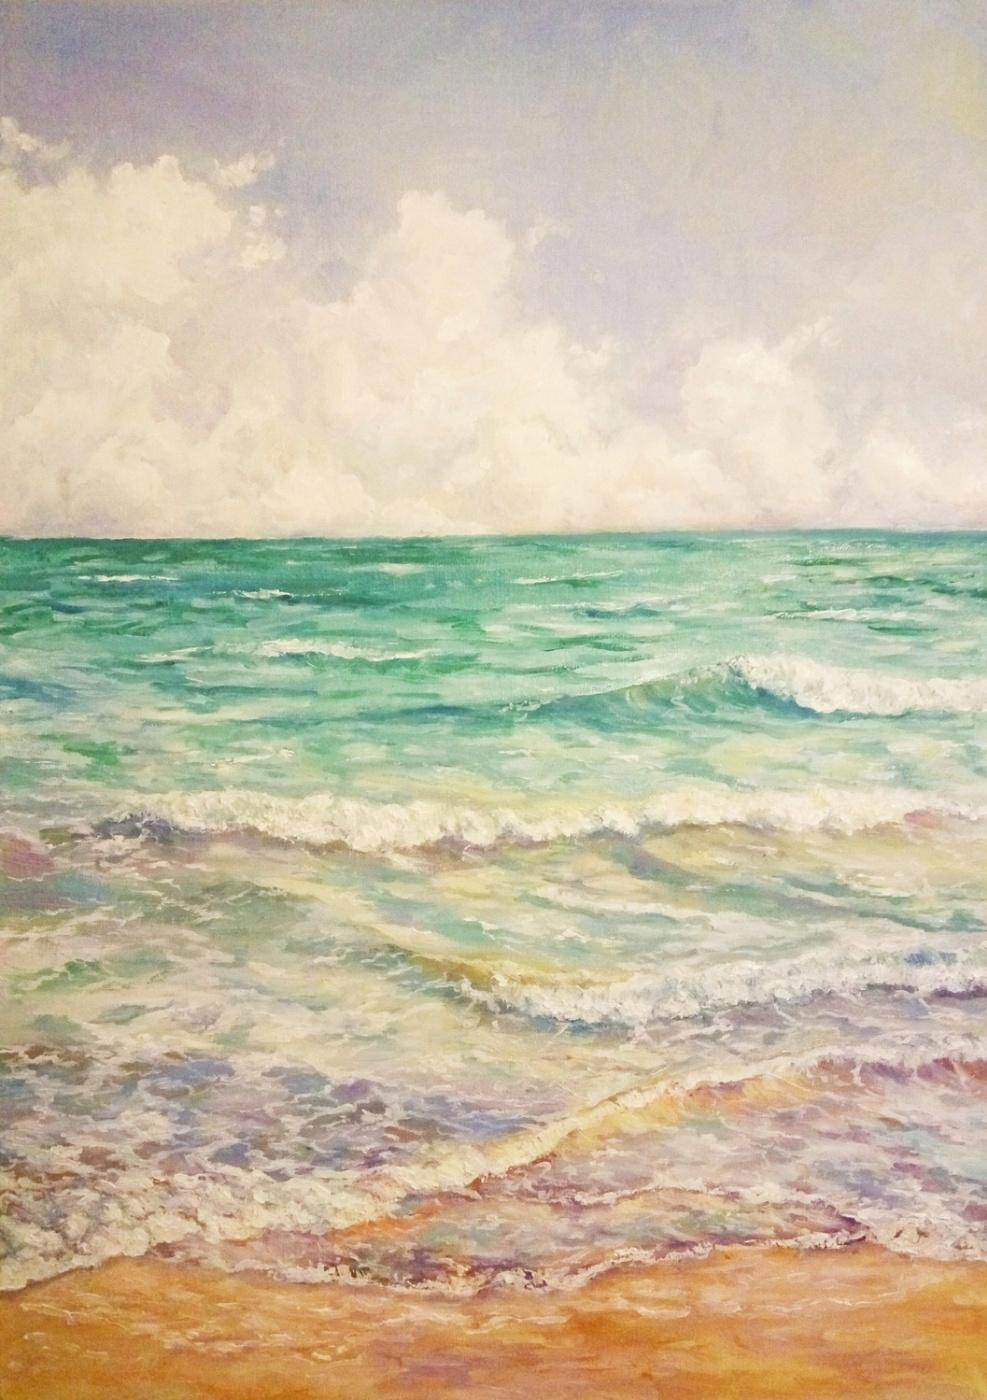 Olga Alexandrovna Suslova. Paintings, portraits - oil, pastel, pencil - to order.